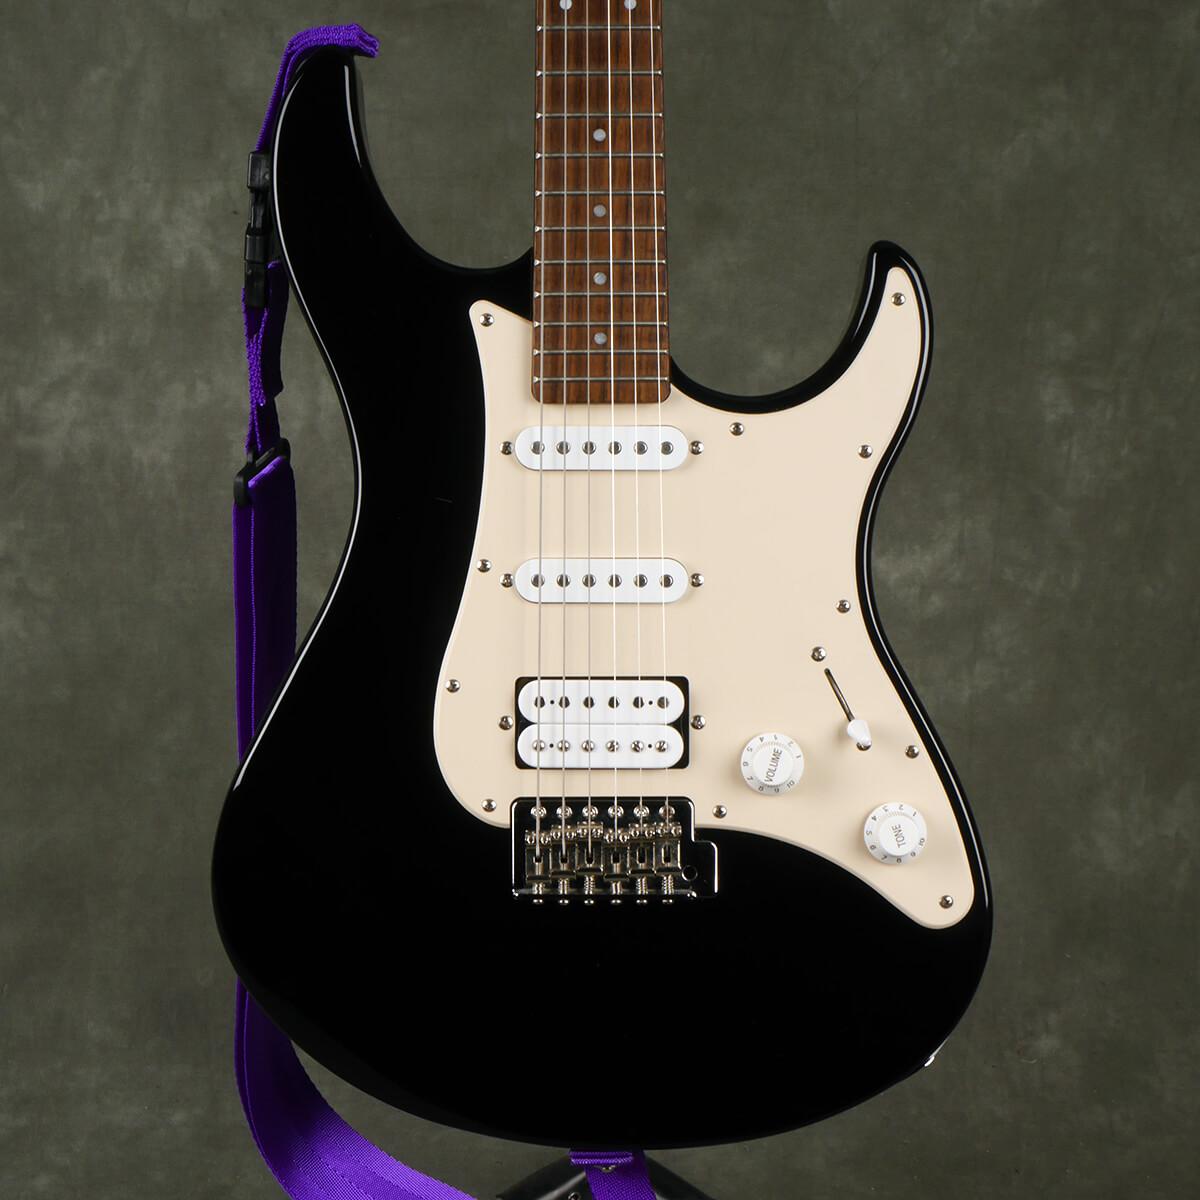 Yamaha Pacifica 112 Electric Guitar - Black - 2nd Hand